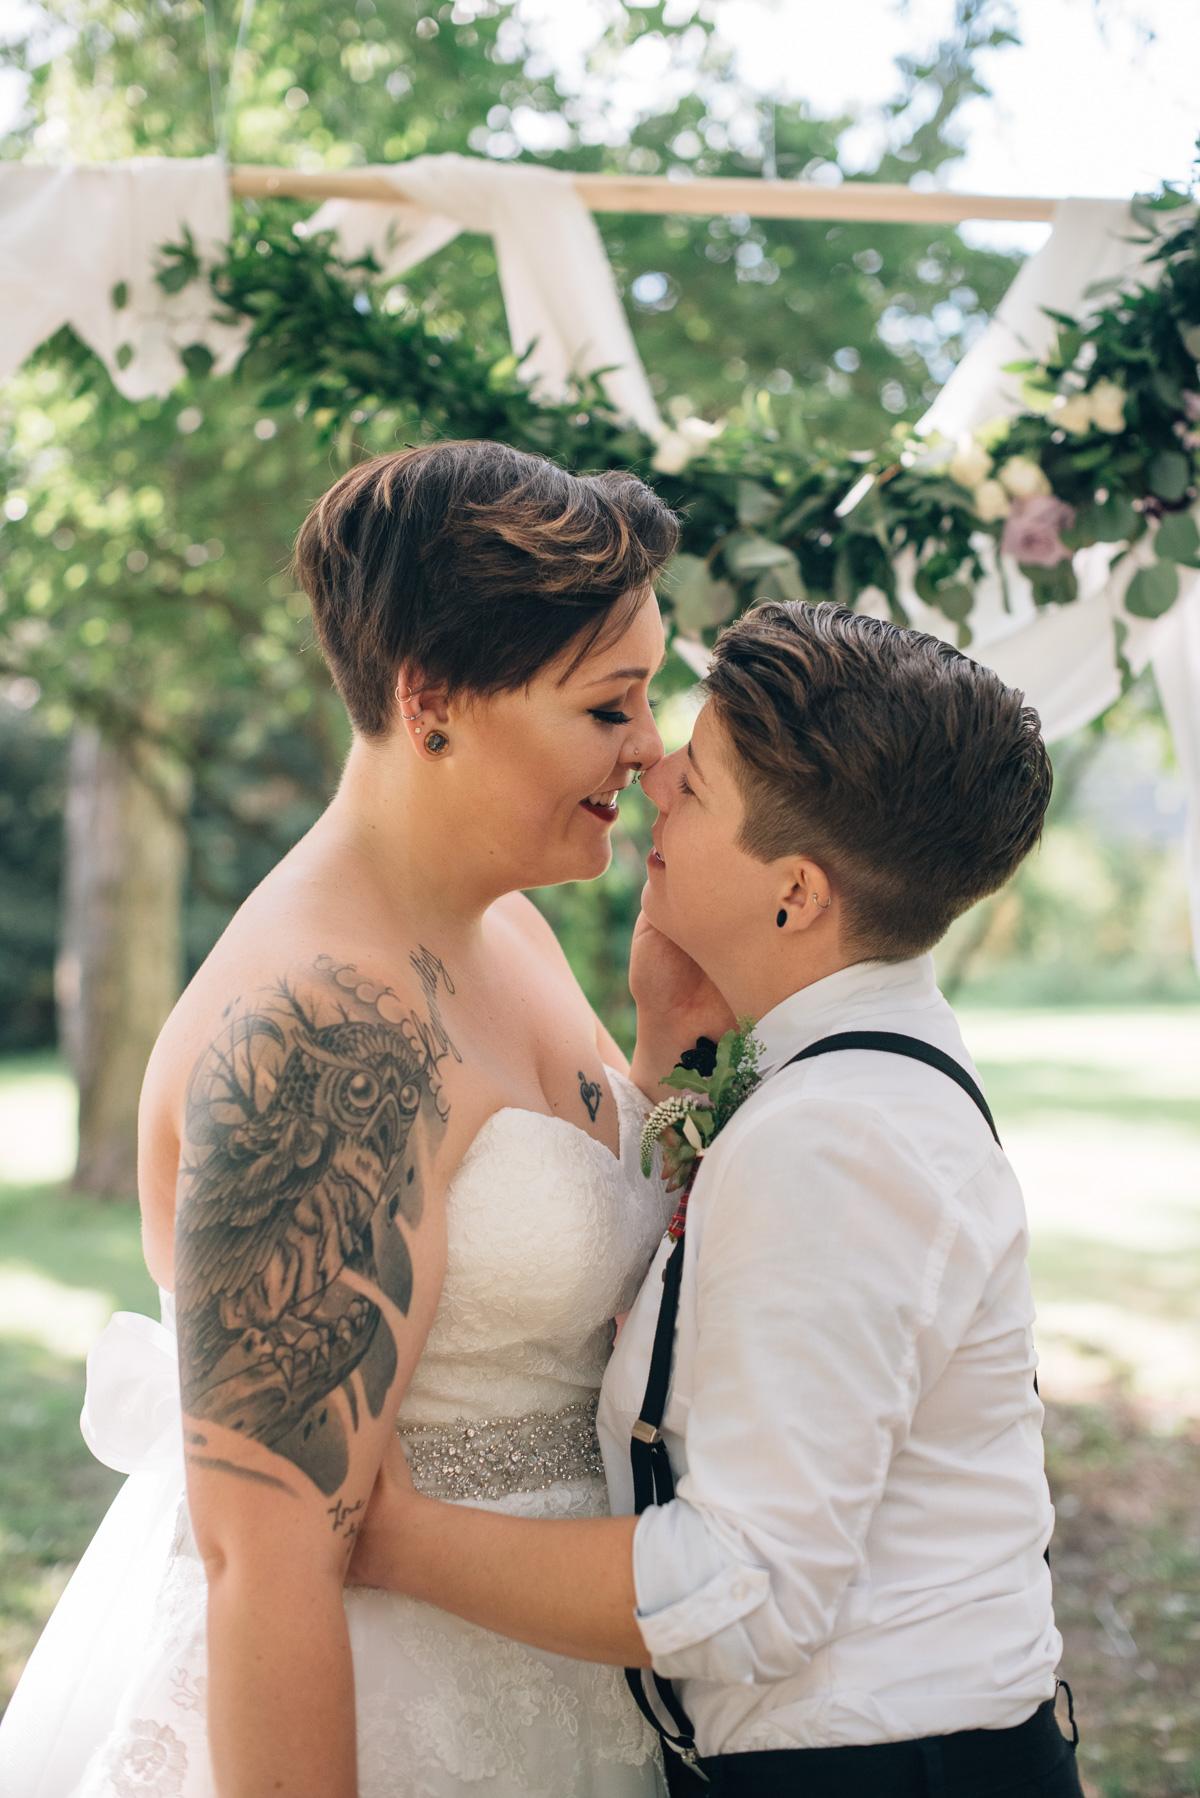 sara-wilde-photography-vineyard-bride-swish-list-beamer-falls-manor-grimsby-wedding-55.jpg